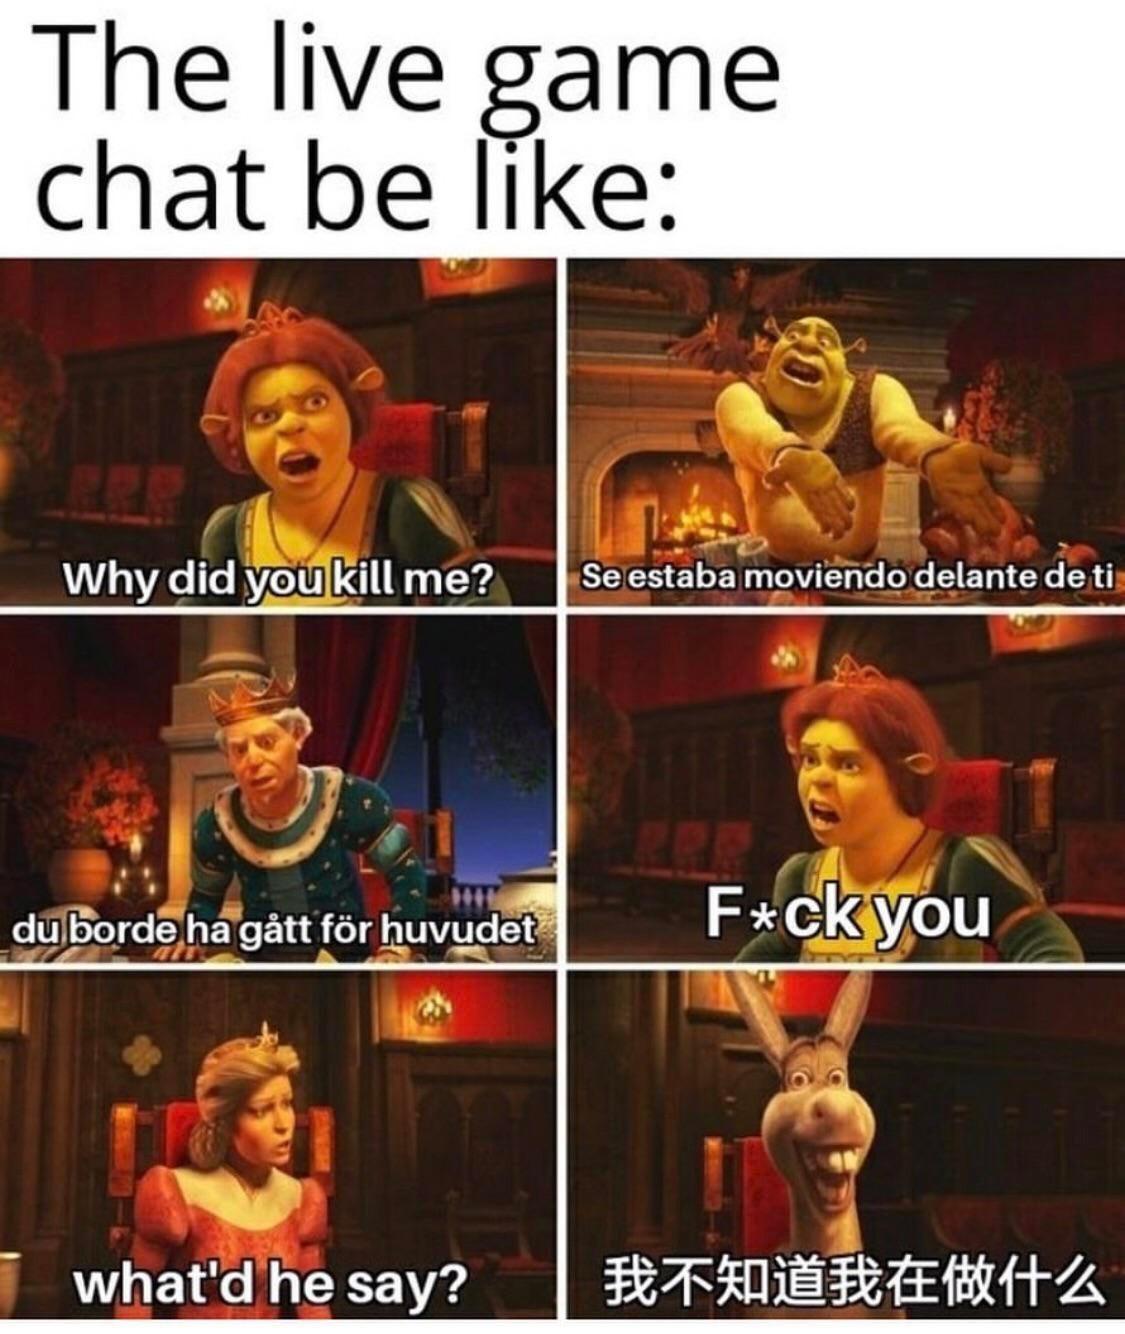 I miss game chat - meme